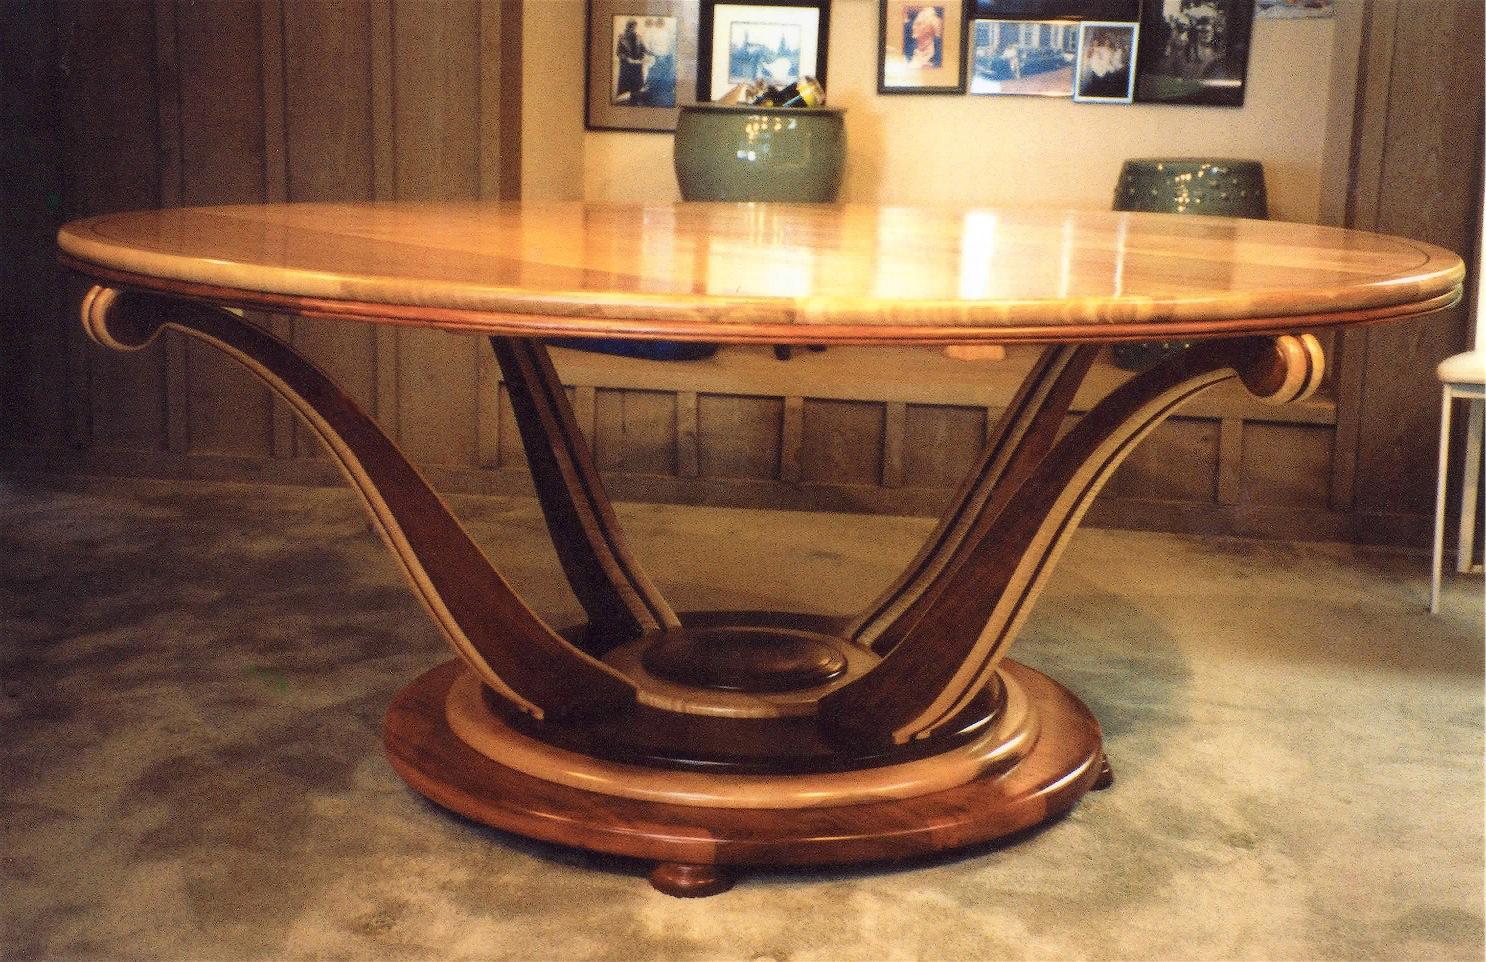 Molly's Table